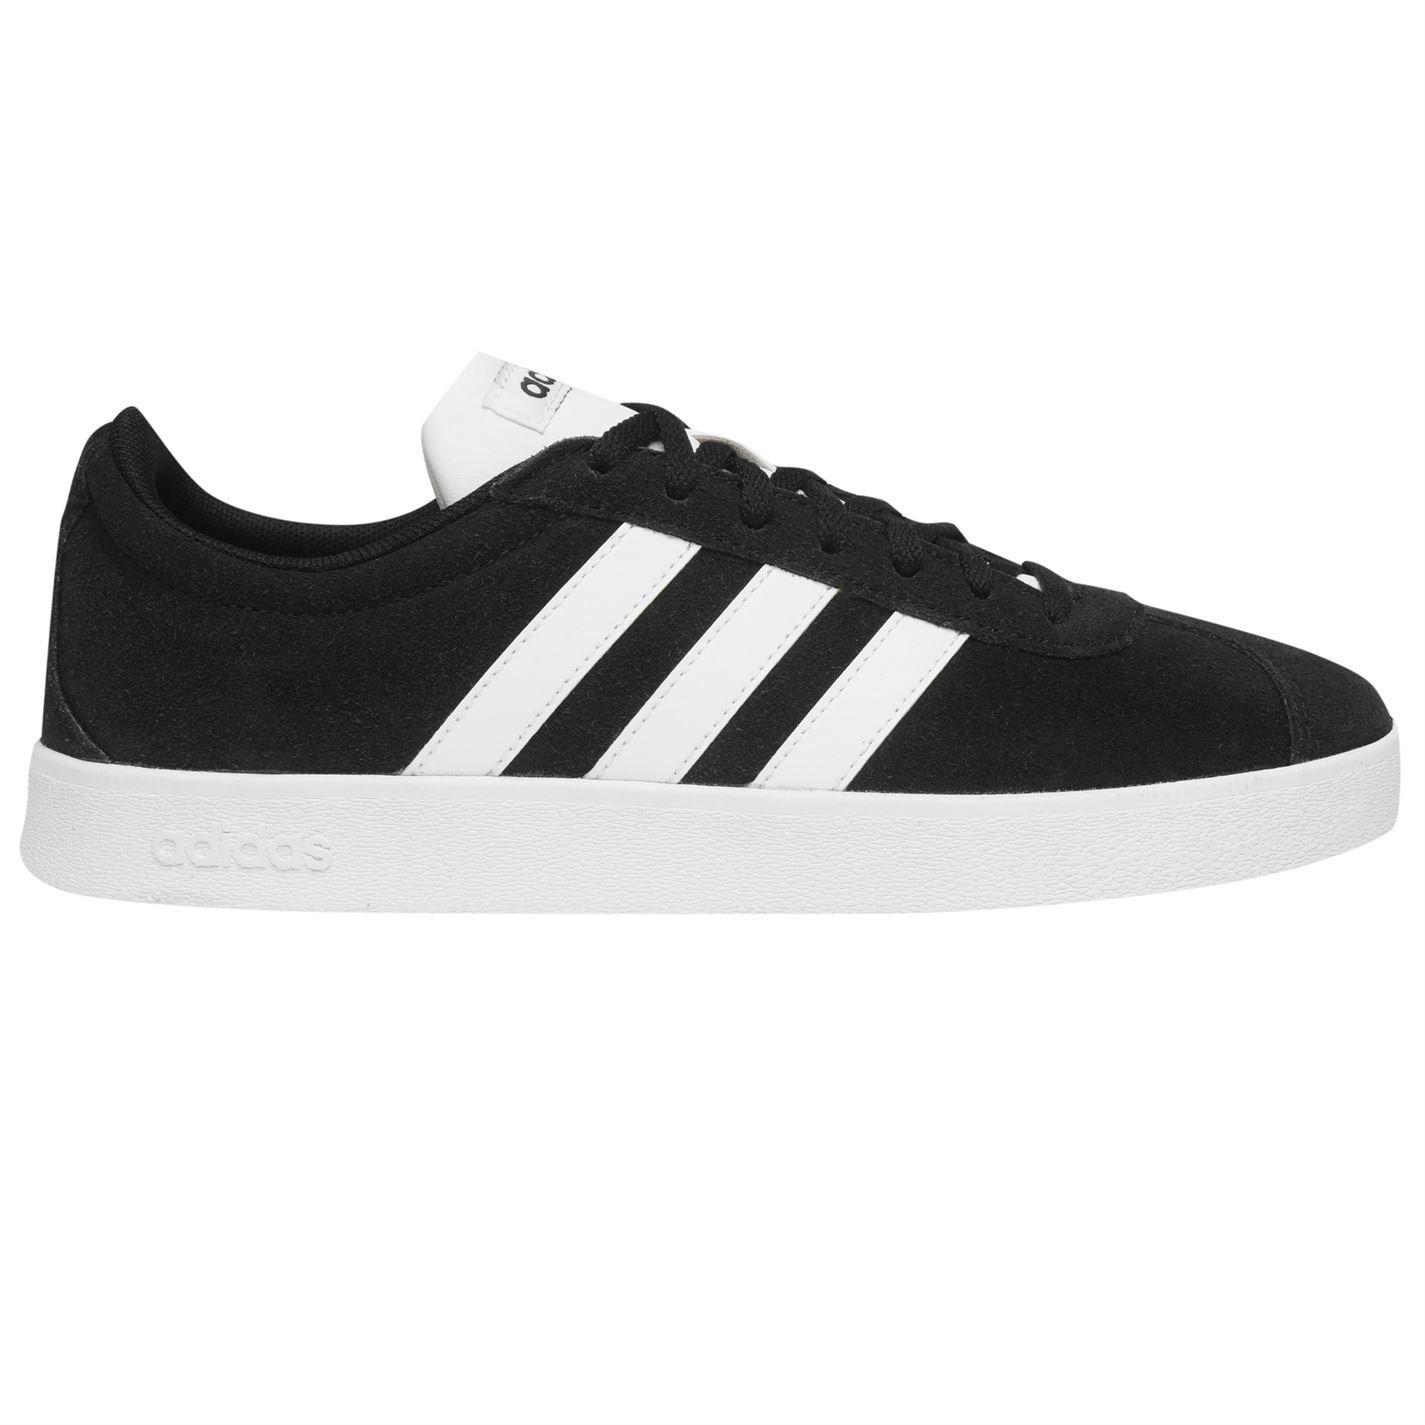 Vl Da Scarpe Court Ginnastica Adidas Uomo 2 dwvX4xax